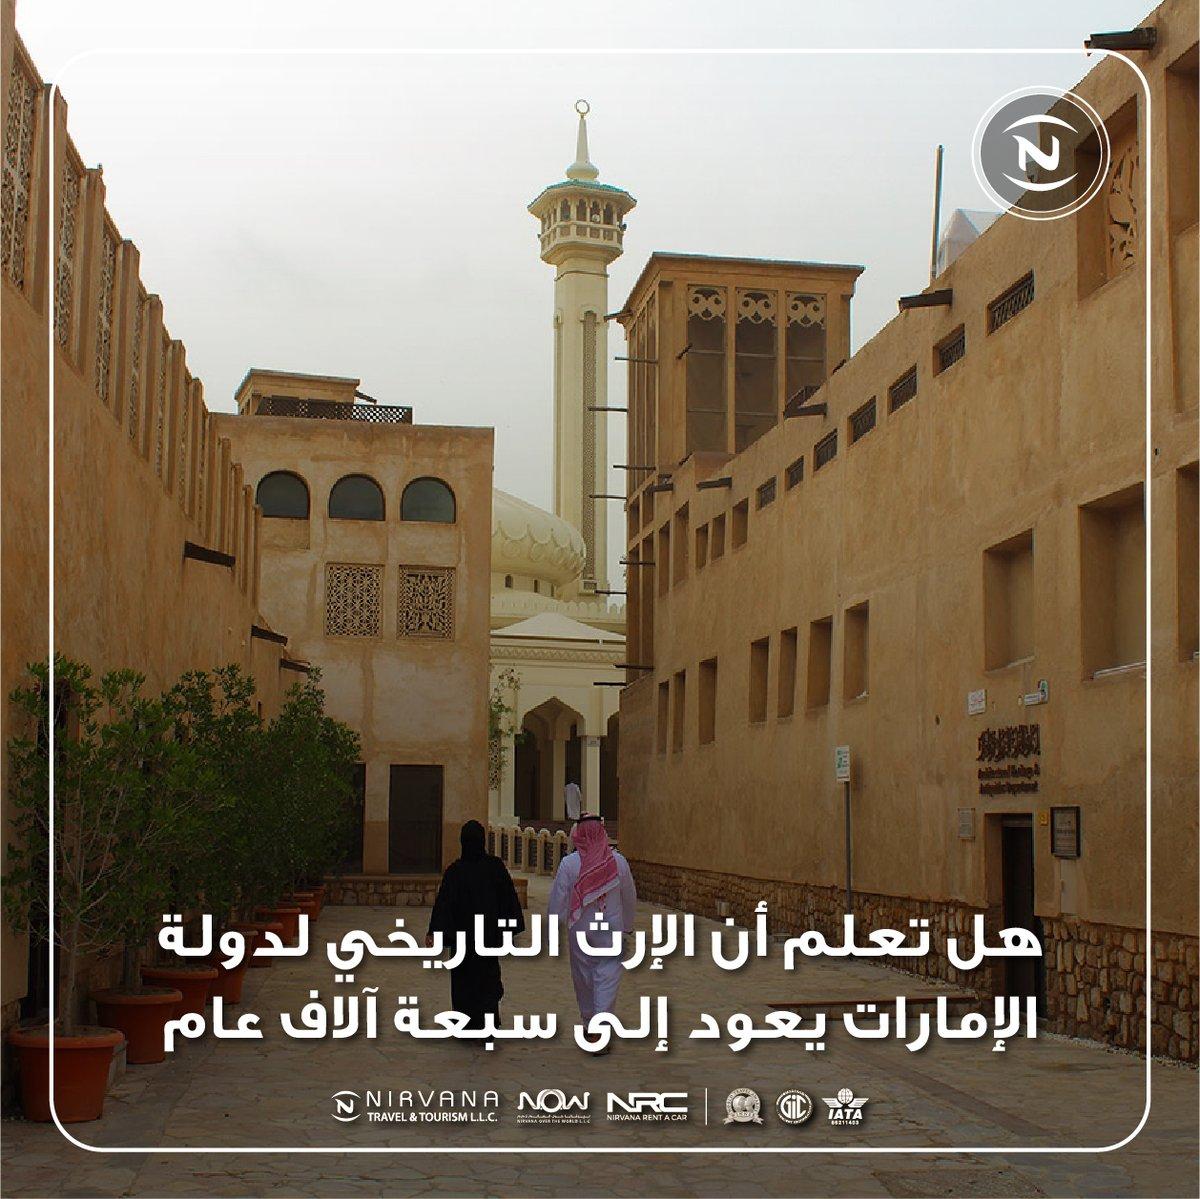 #Emirates #history #staysafe #traveling #traveler #travelphotography #passportready #Abudhabi #UAE #dubai #dubailife #visitdubai #dxb #morning #potd #travel #traveltheworld #safir #explore #discover #internationaltravel #instaSundaypic.twitter.com/RaVukKnTQ3